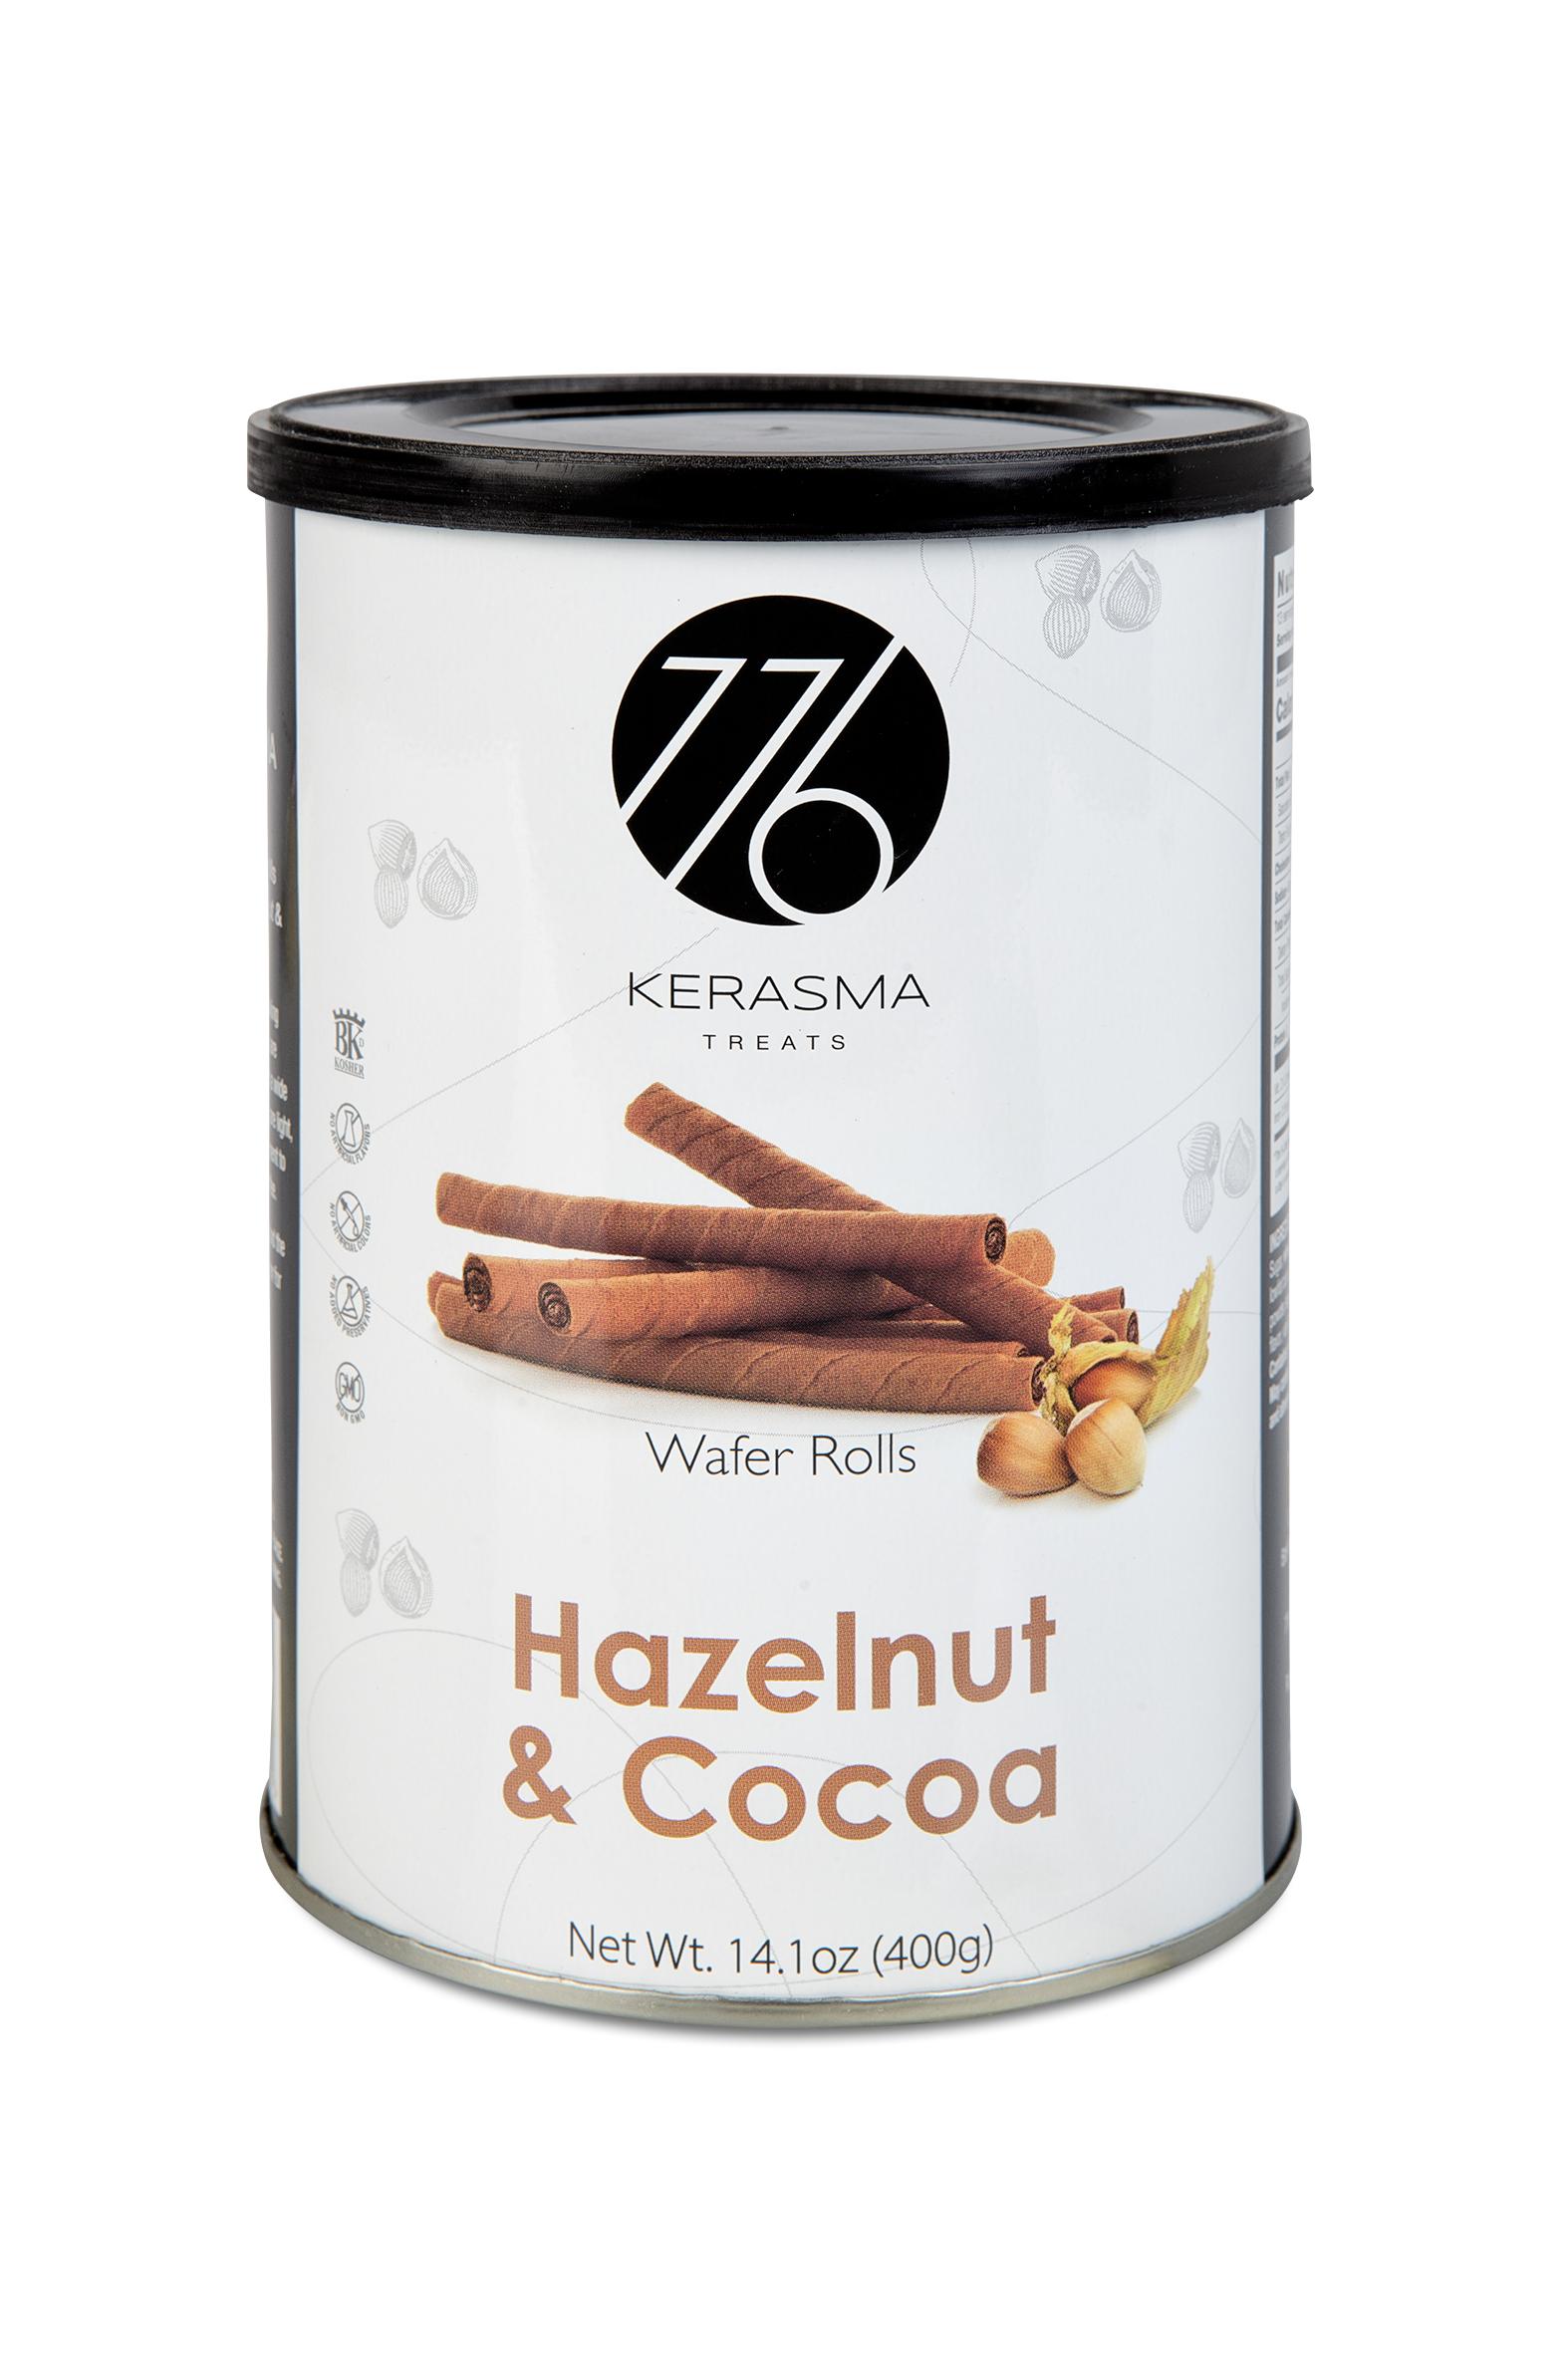 Hazelnut & Cocoa Wafer Rolls